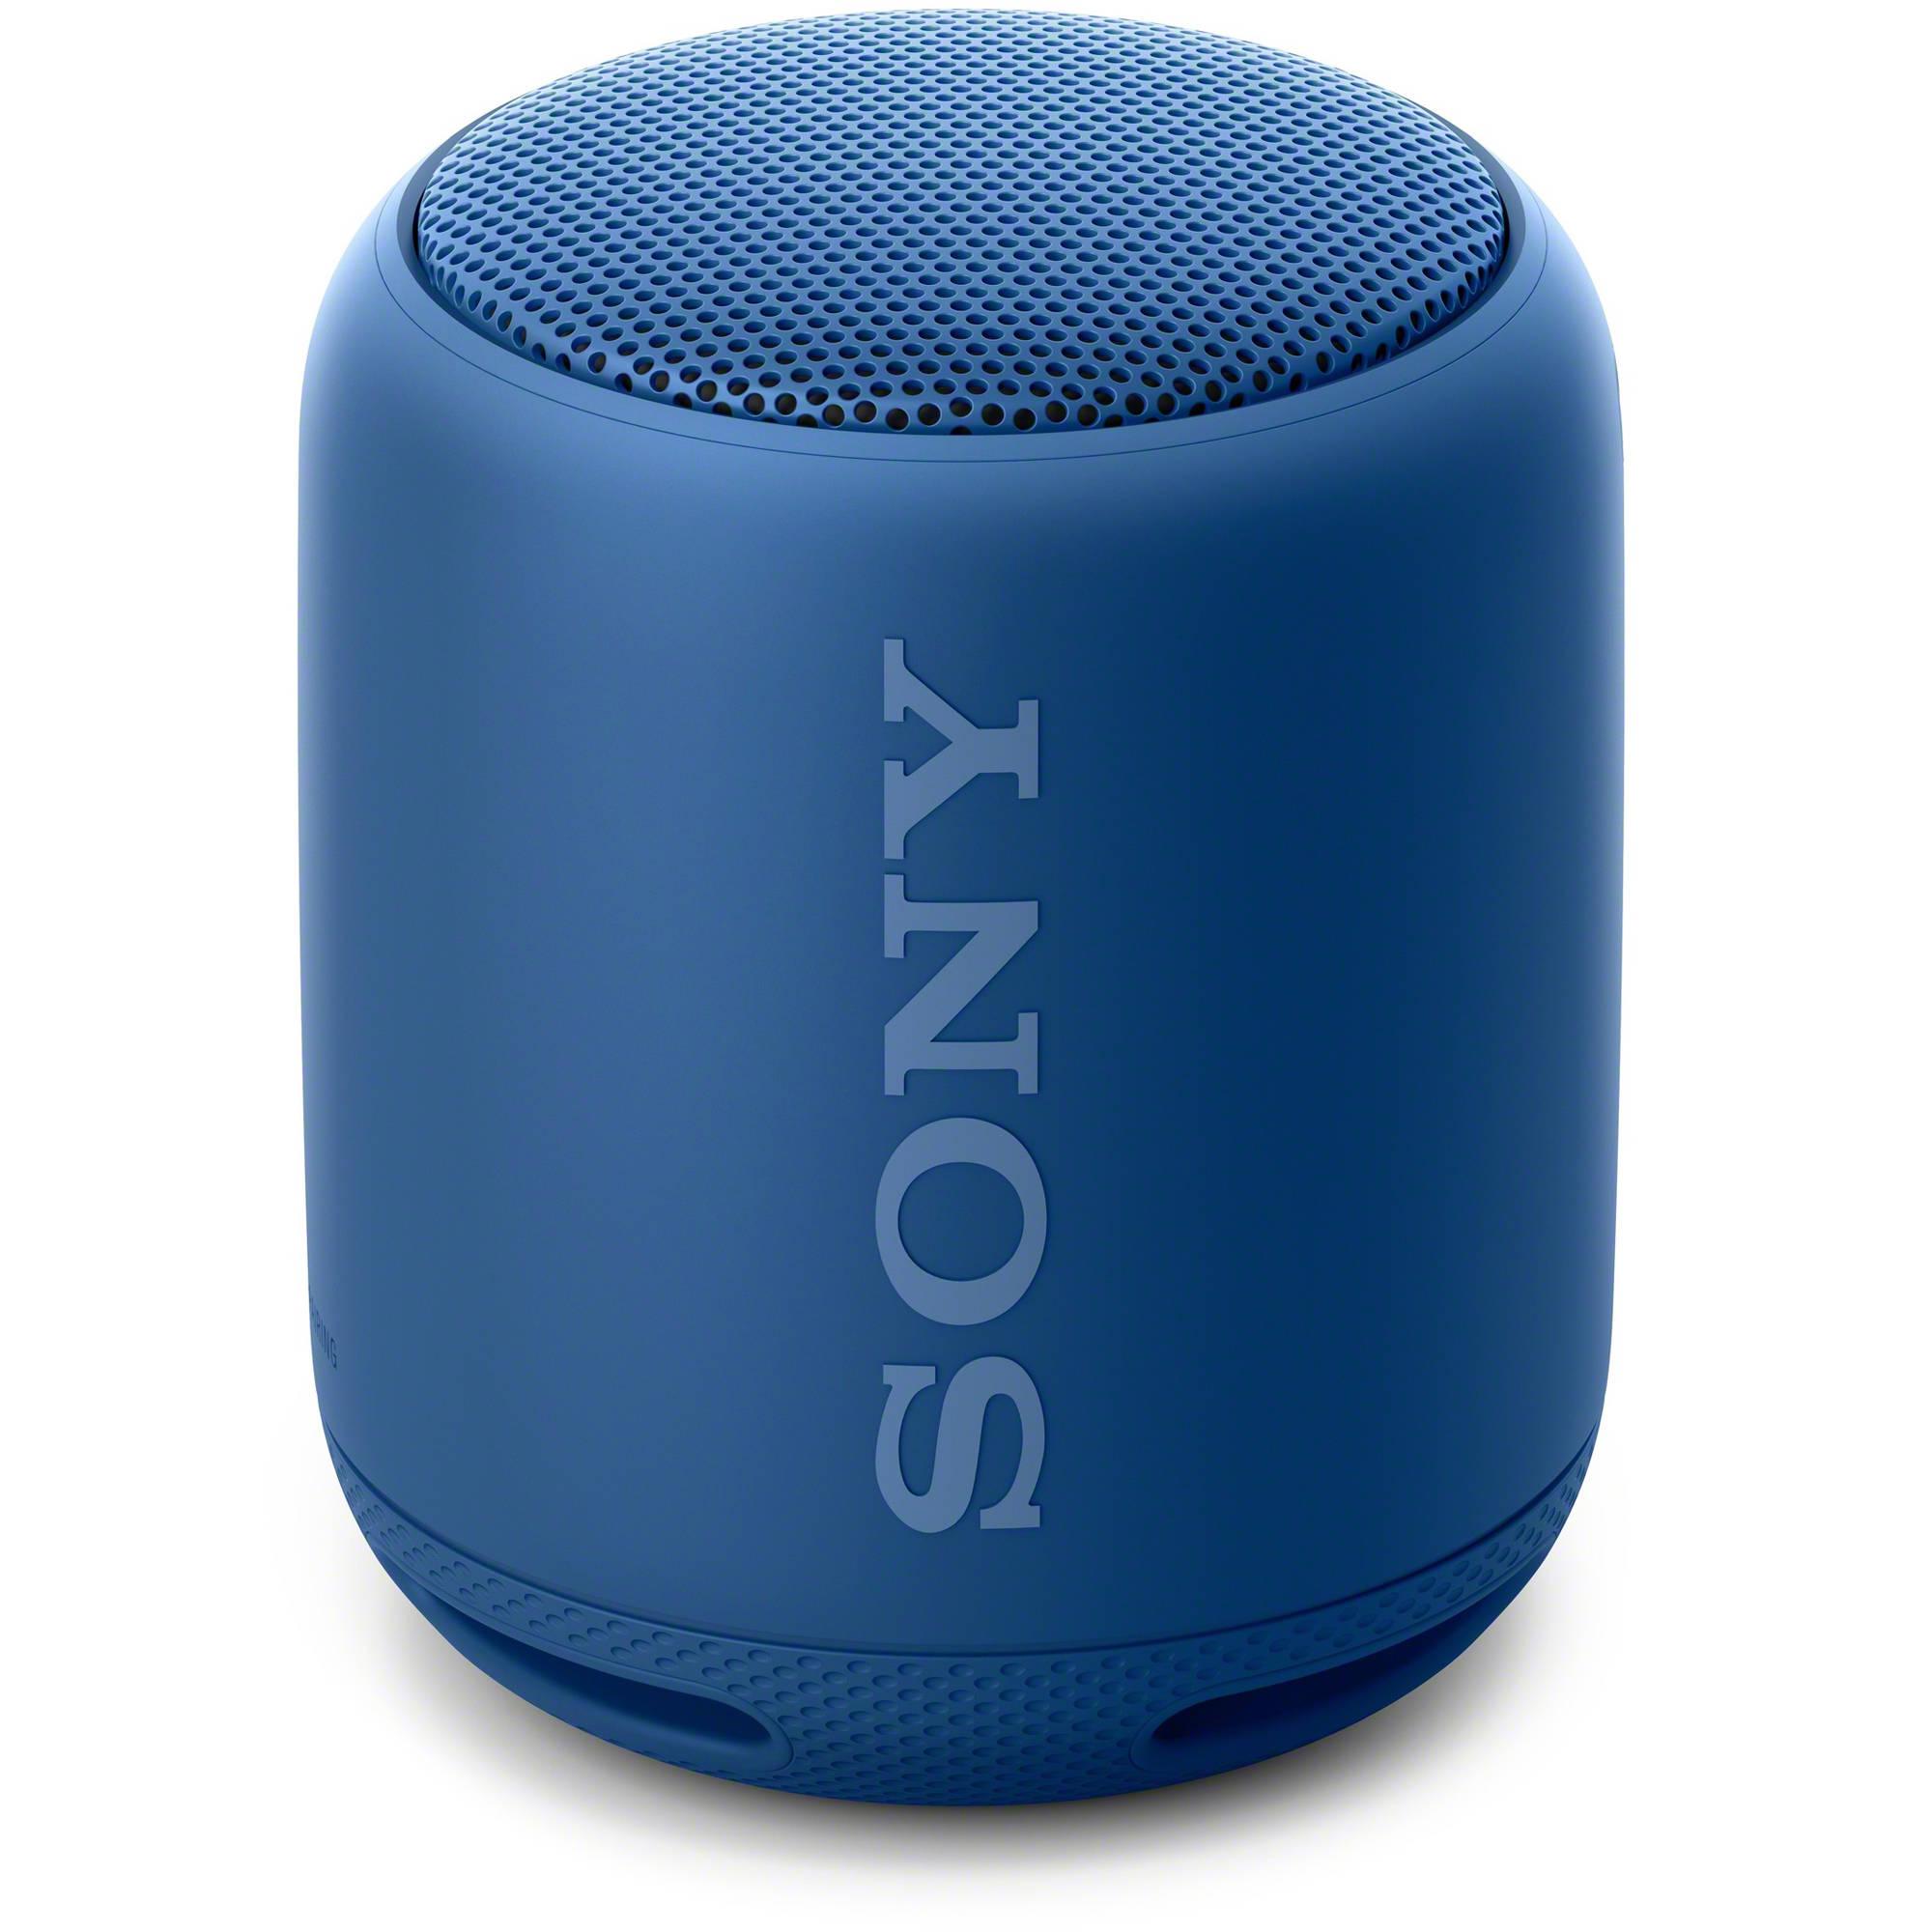 sony srs xb10 bluetooth speaker blue srsxb10 blue b h photo